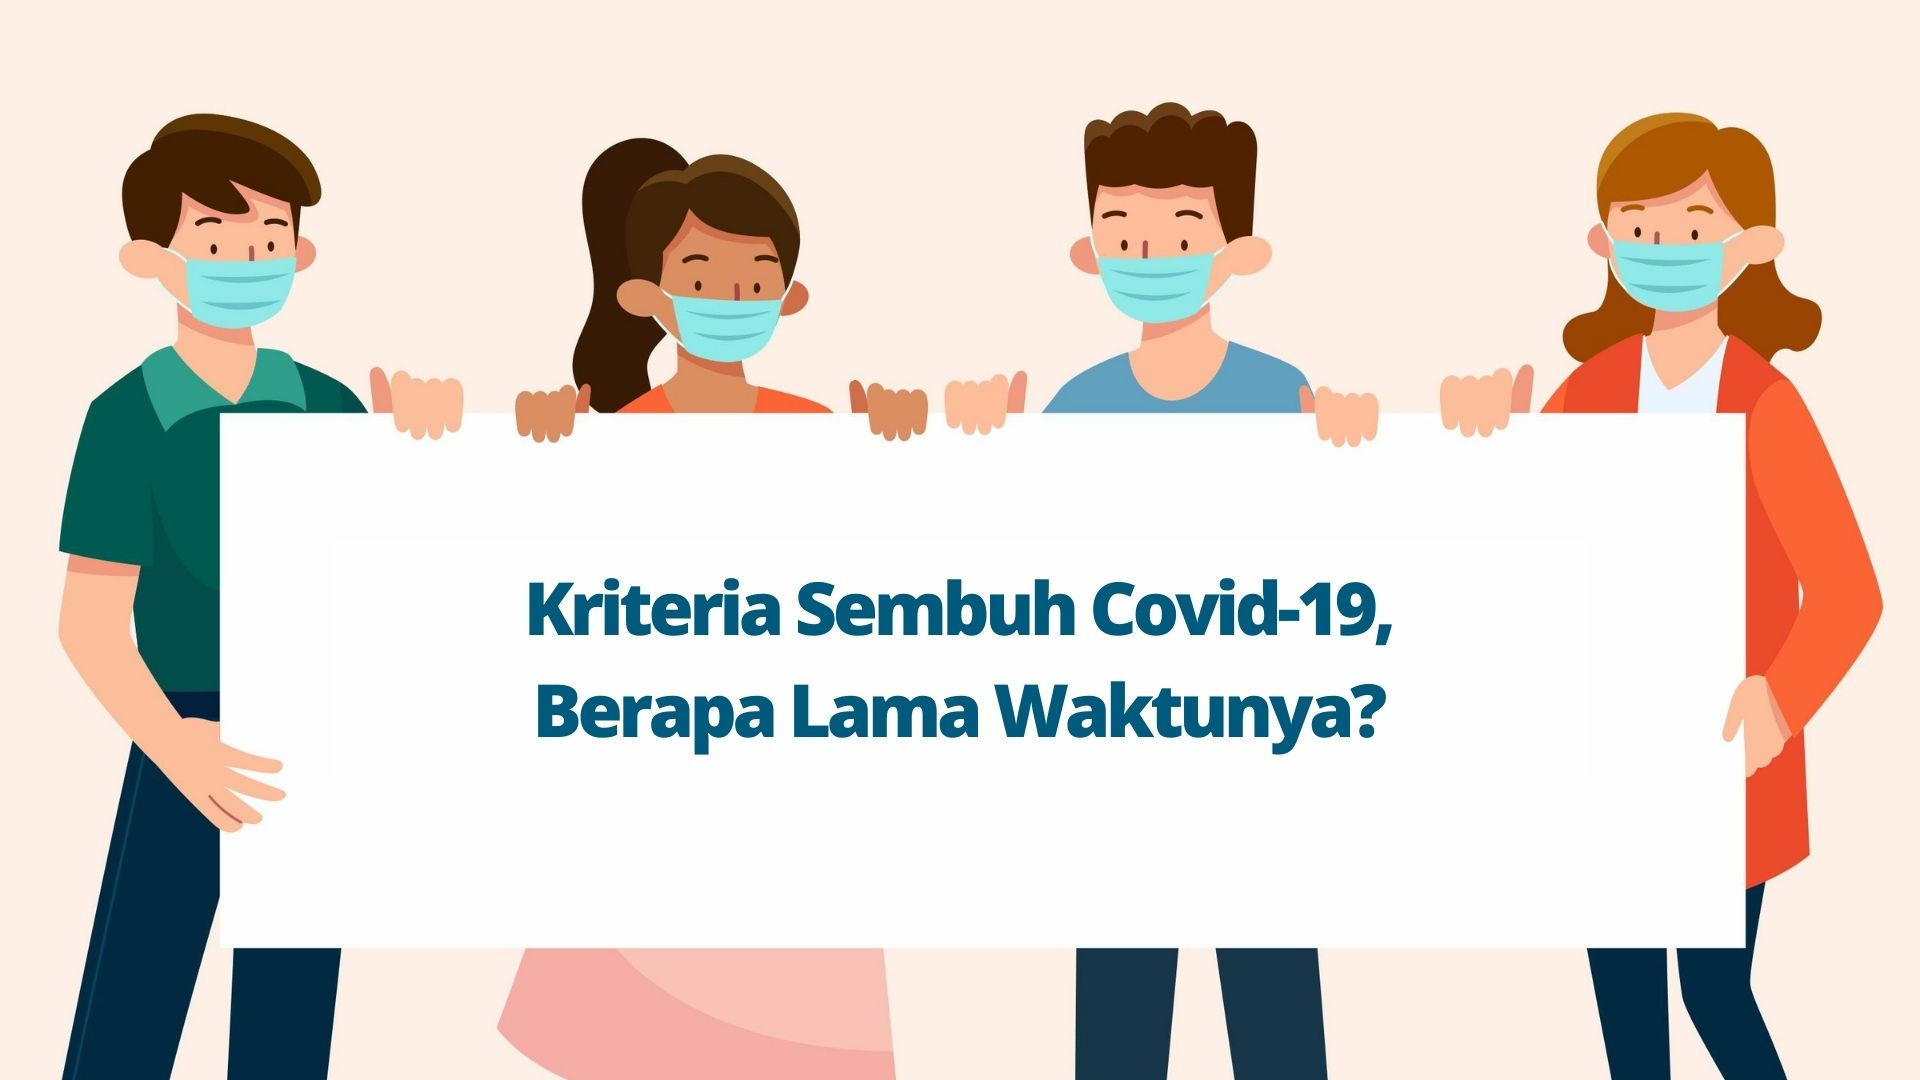 Kriteria Sembuh Covid-19, Berapa Lama Waktunya?